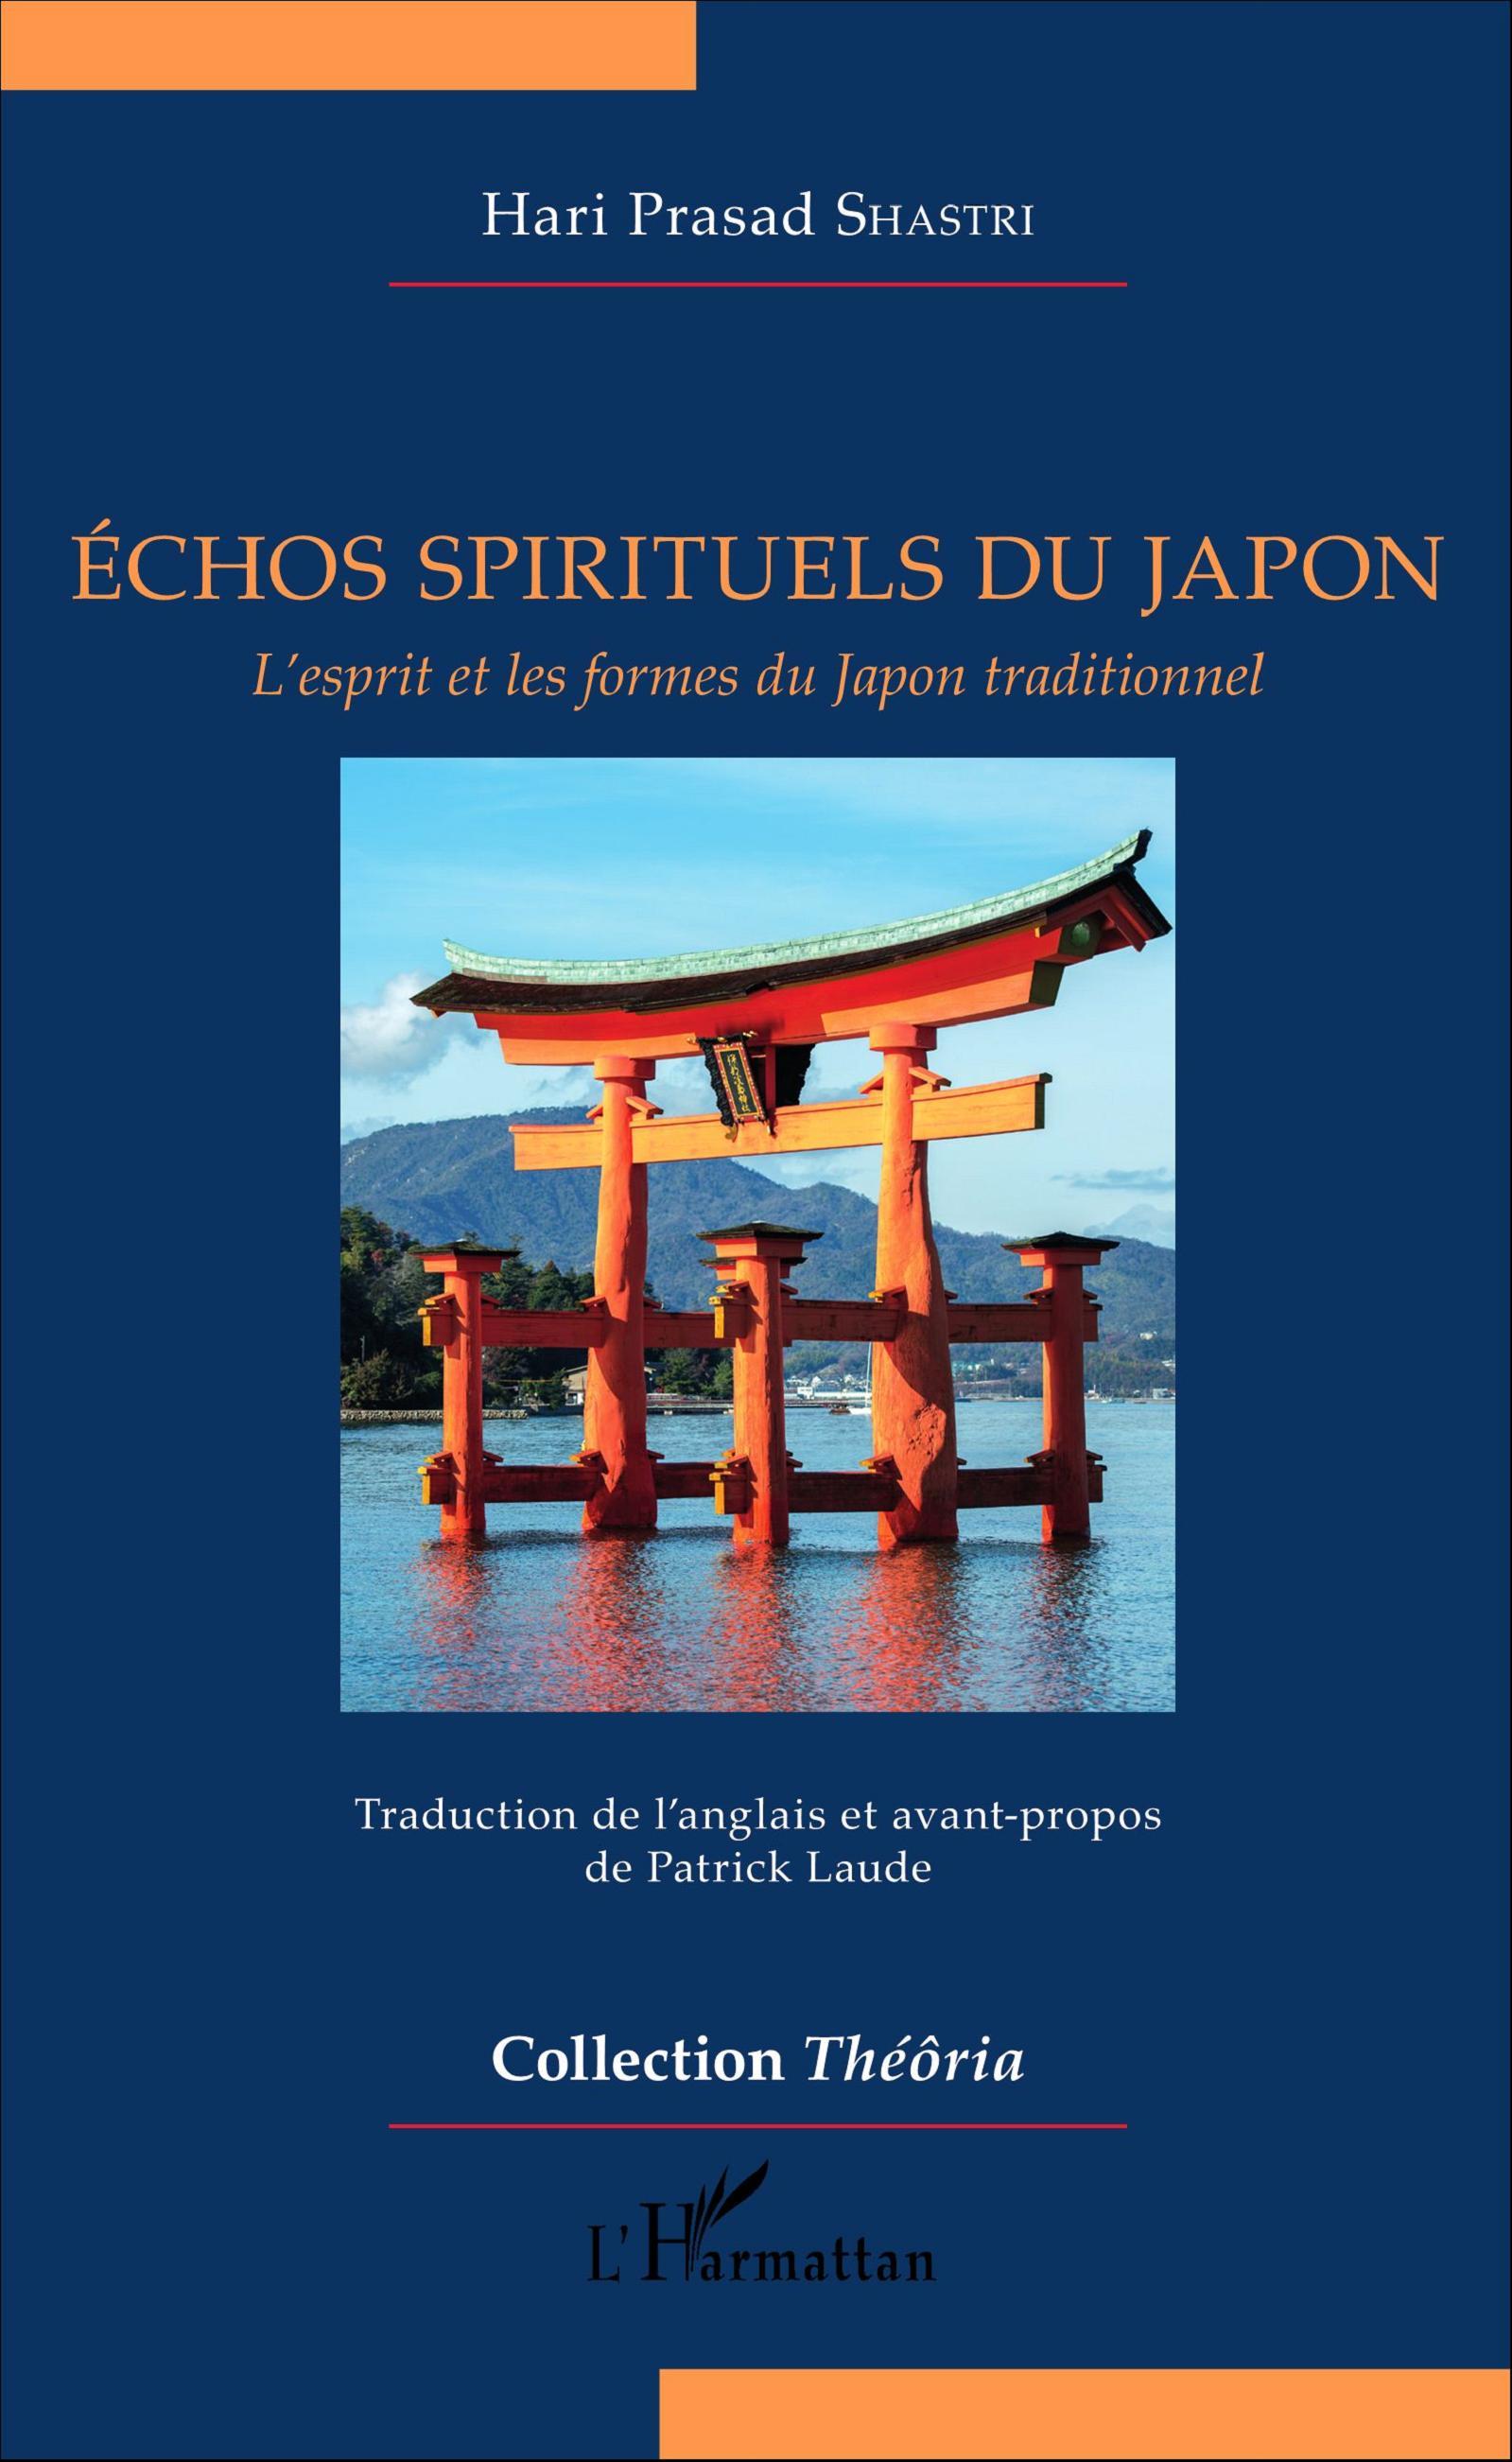 Echos spirituels du